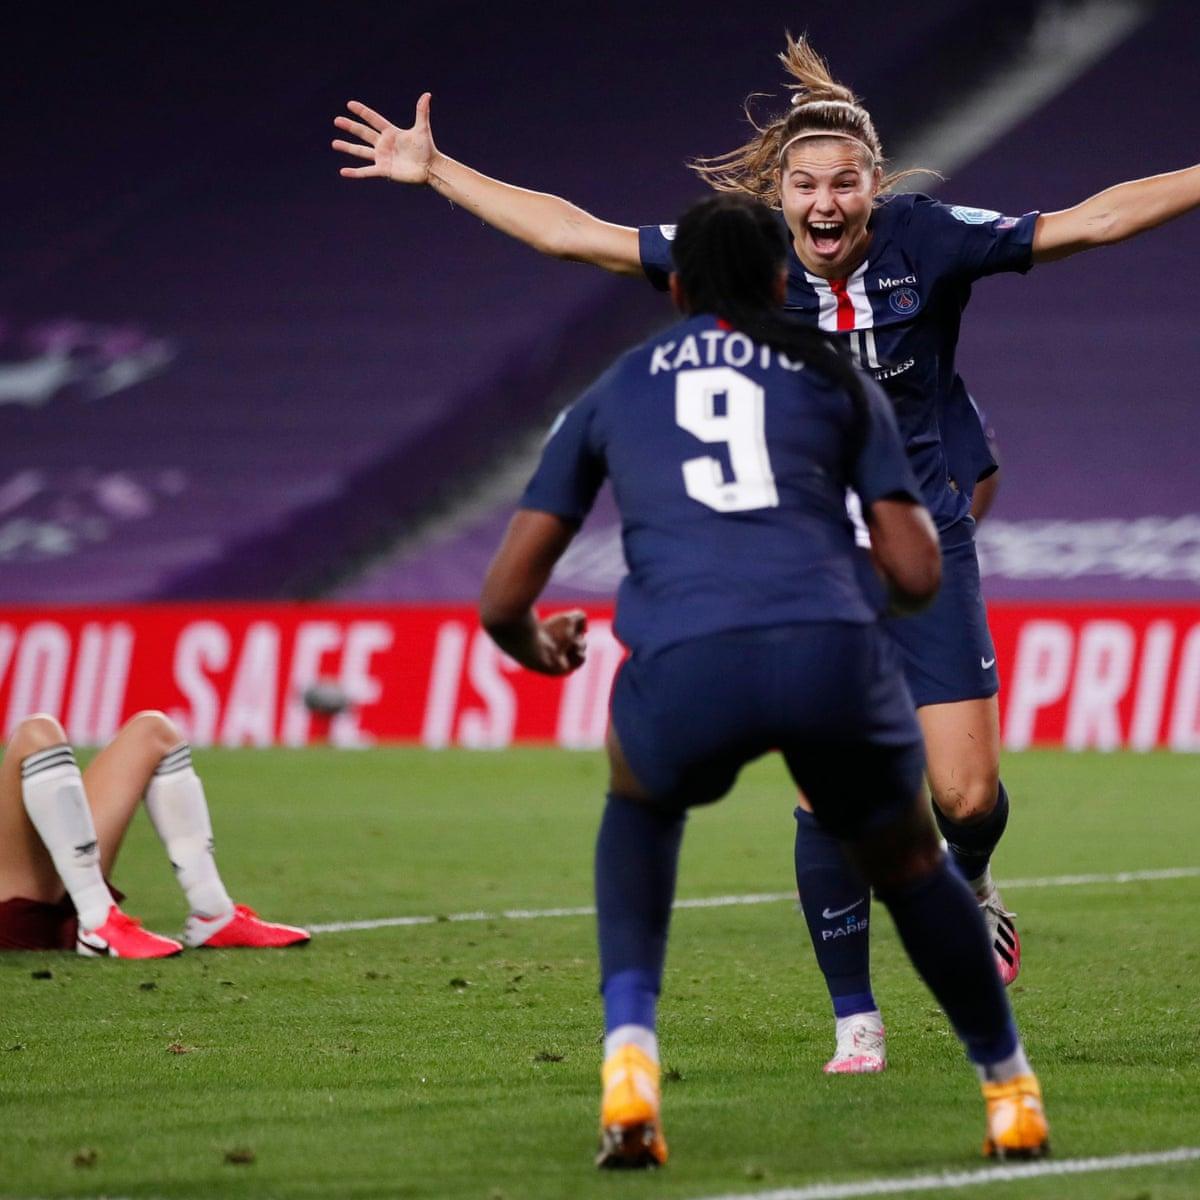 Arsenal 1 2 Psg Women S Champions League Quarter Final As It Happened Football The Guardian